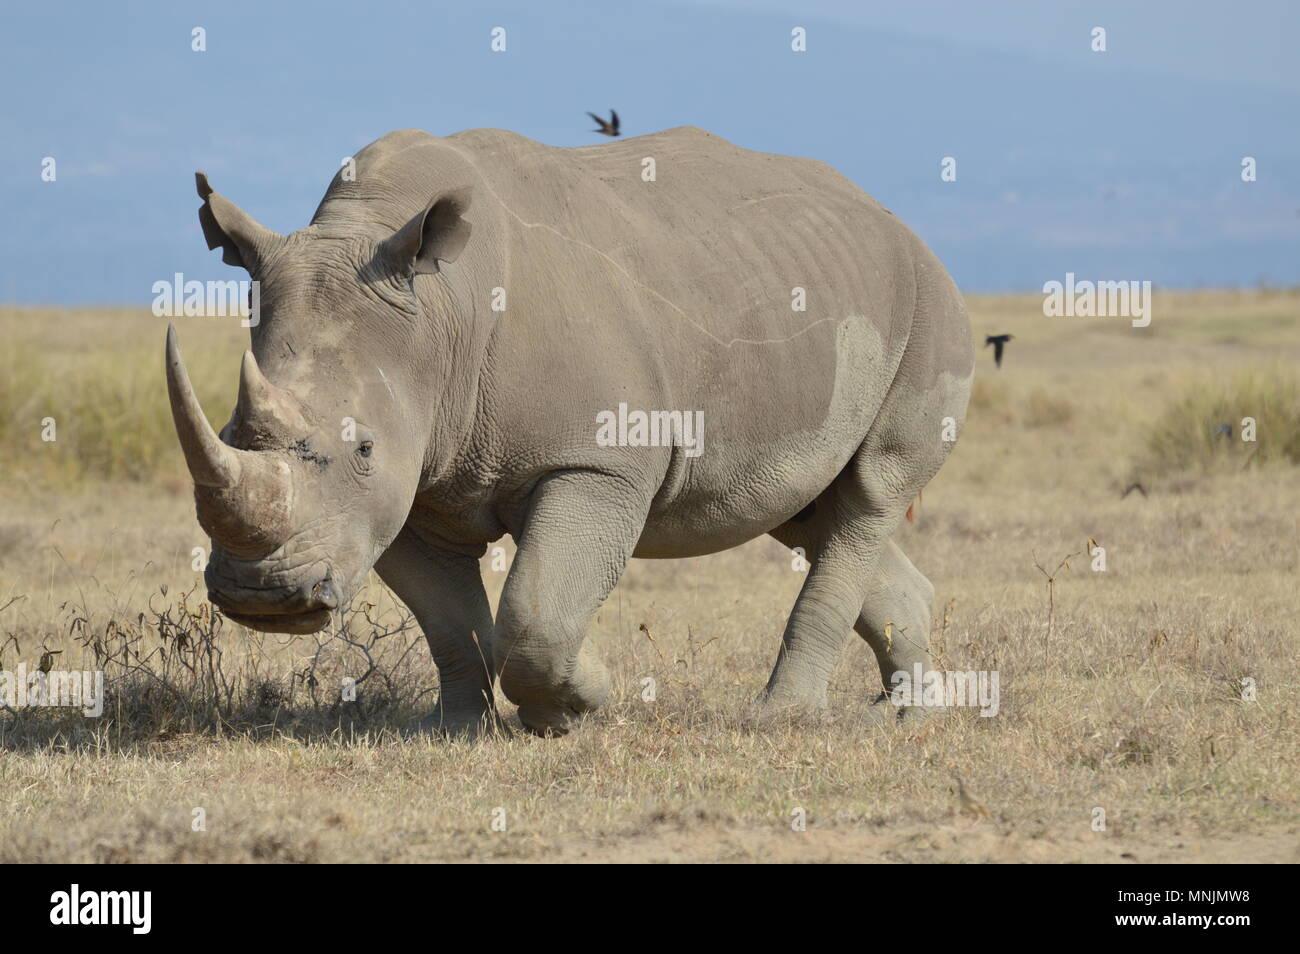 Adult rhino with complete horn walks in Nakuru National Park - Stock Image